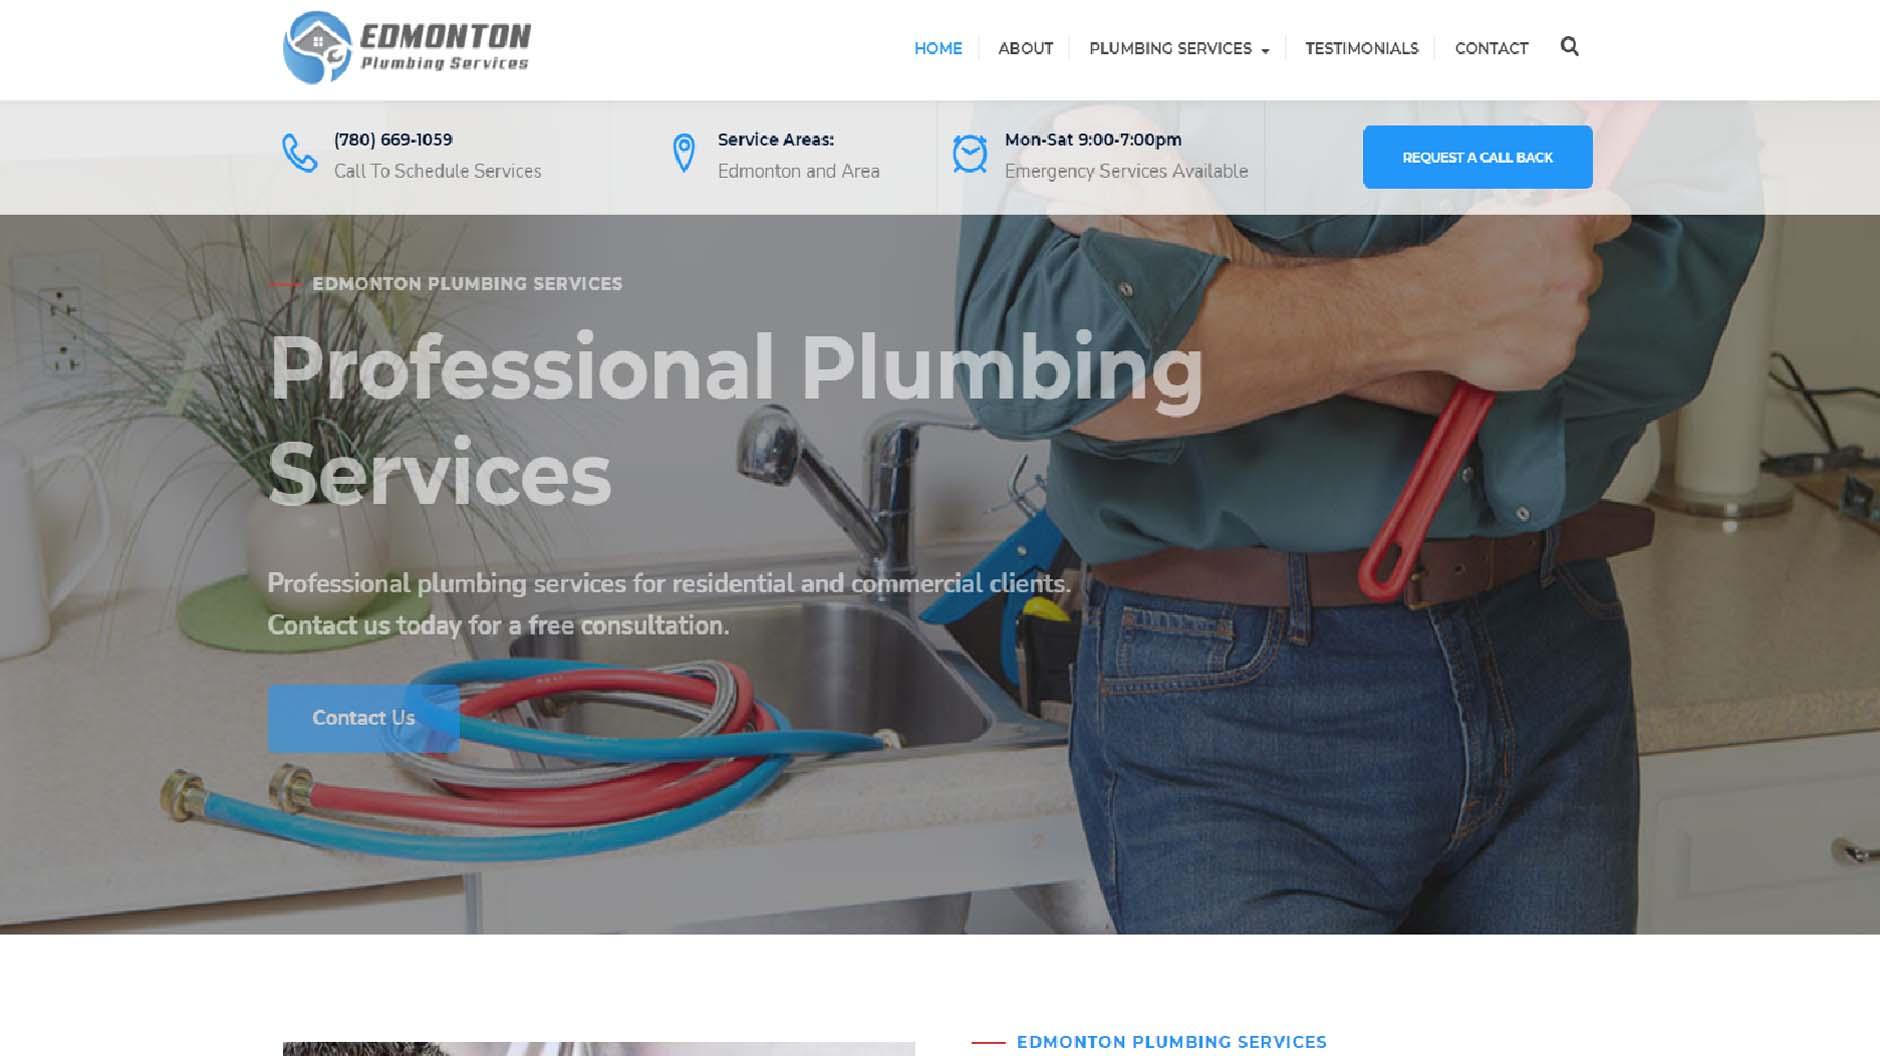 Edmonton Plumbing Services